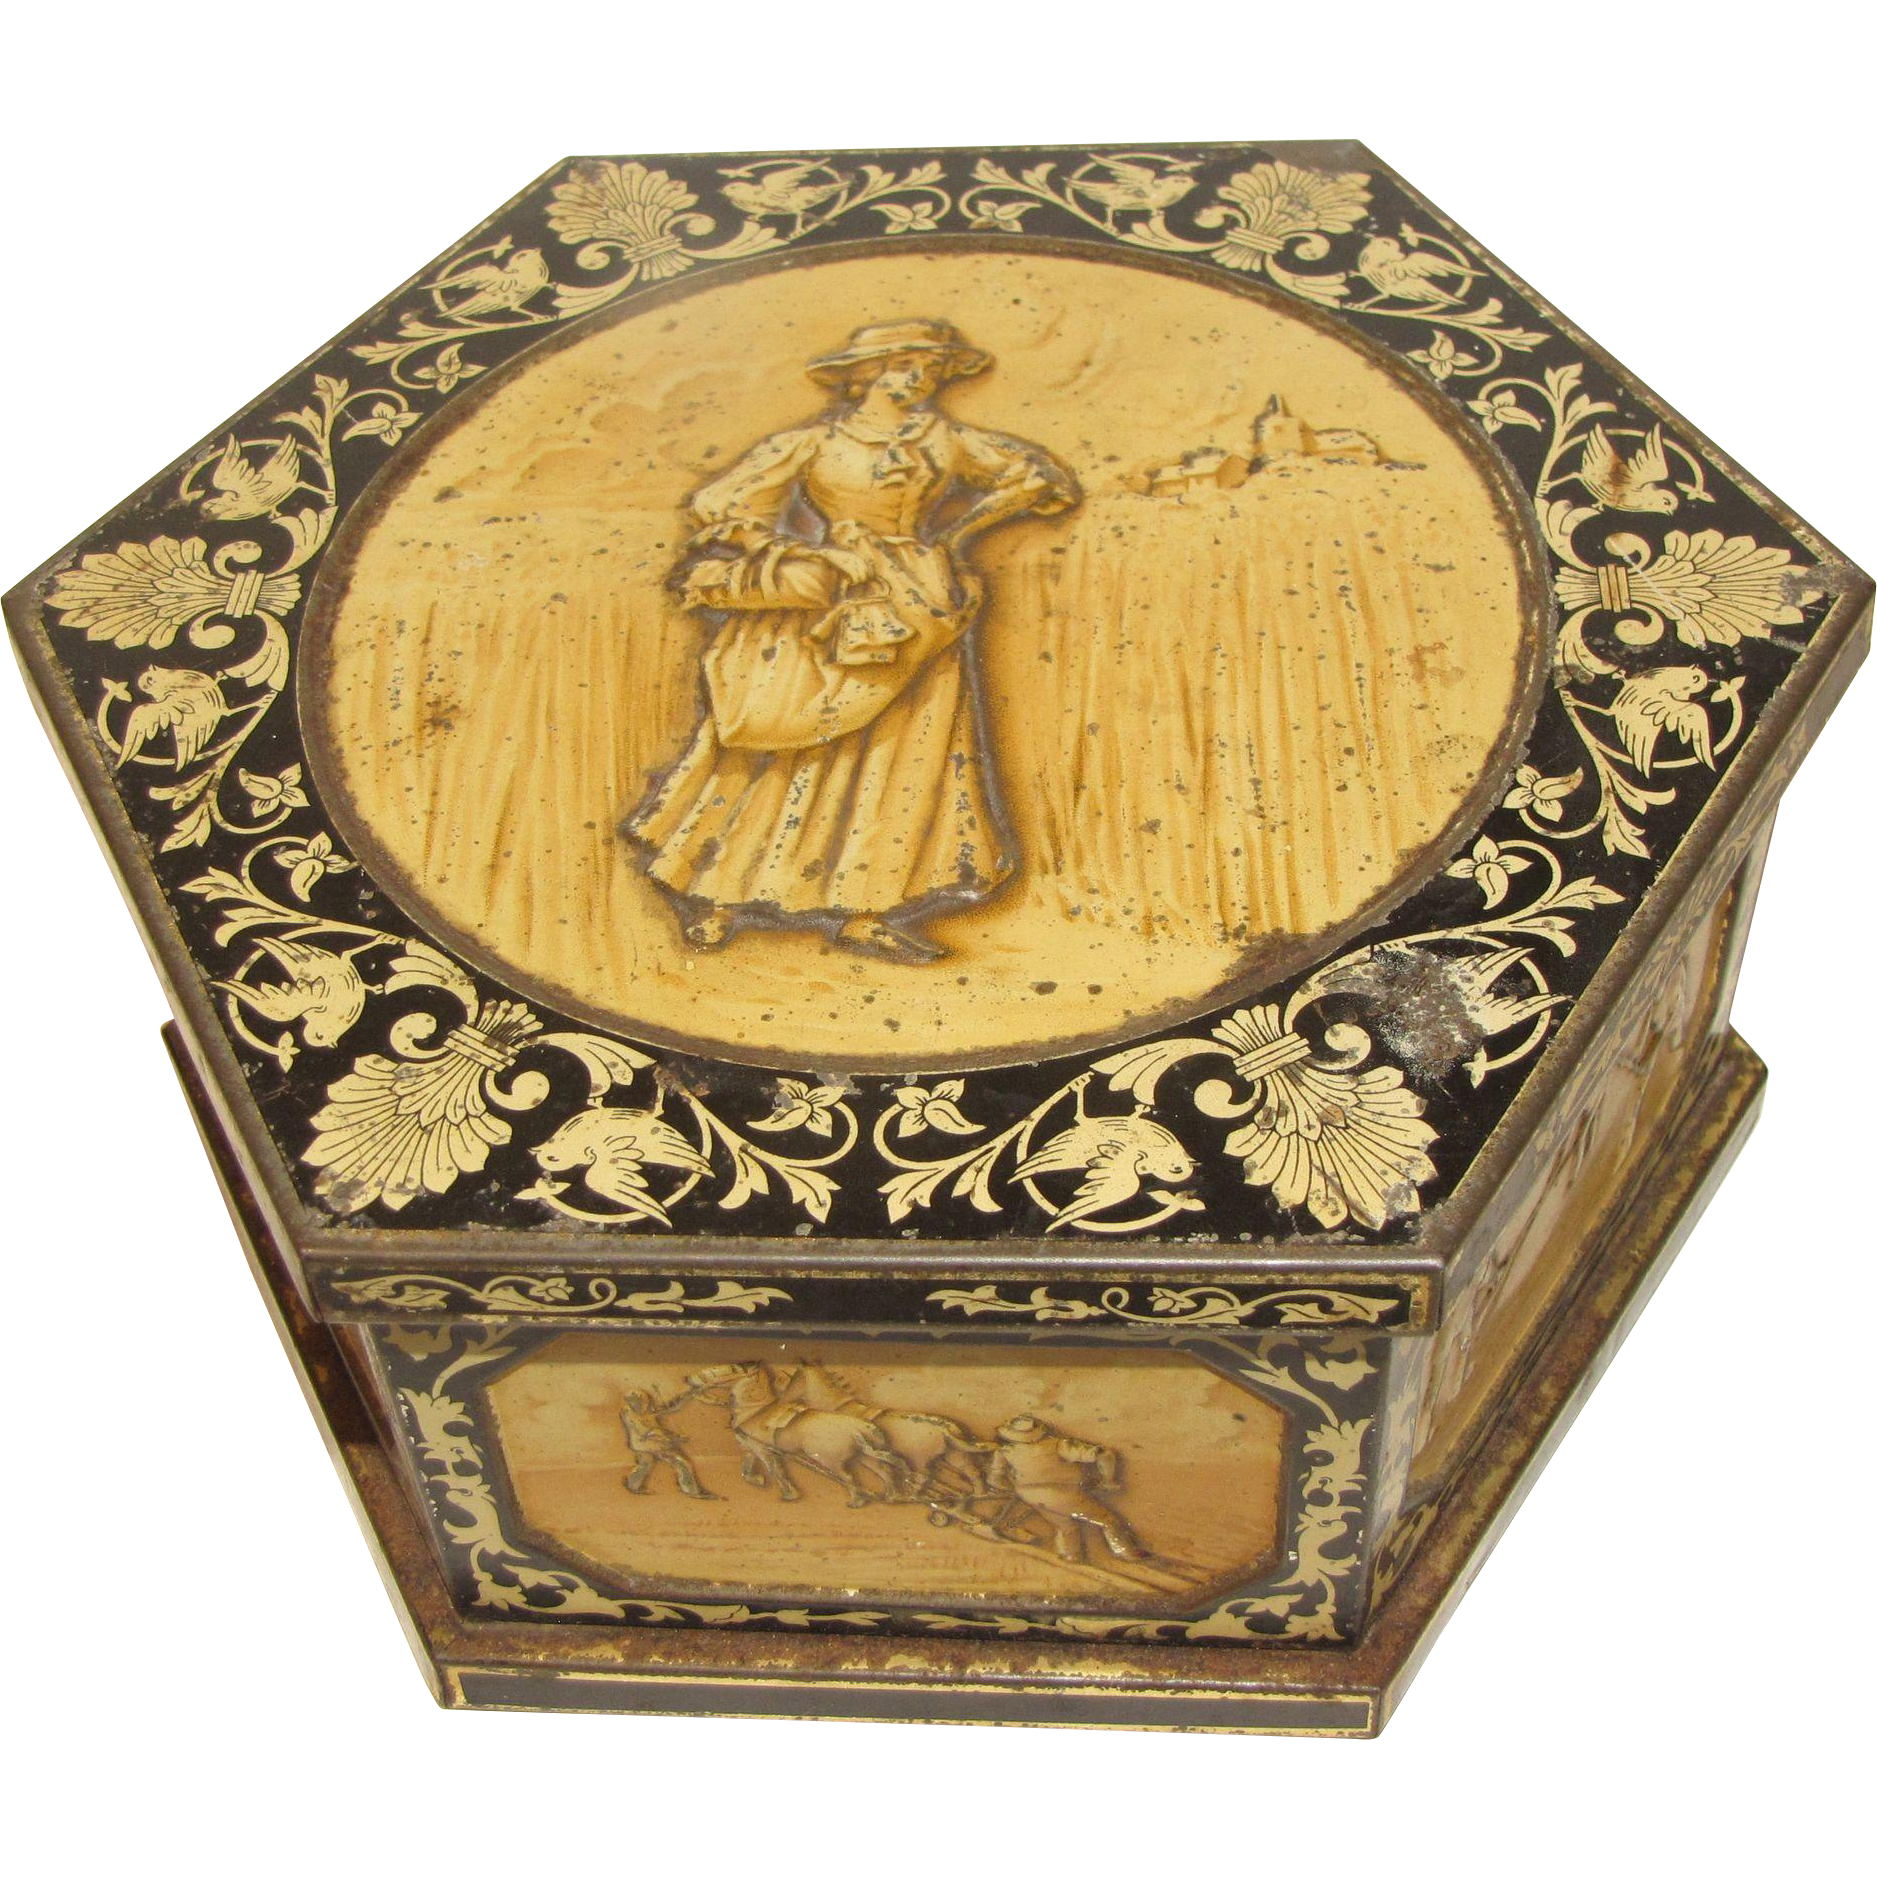 Circa 1908 British Biscuit Tin, HARVEST, Huntley & Palmers